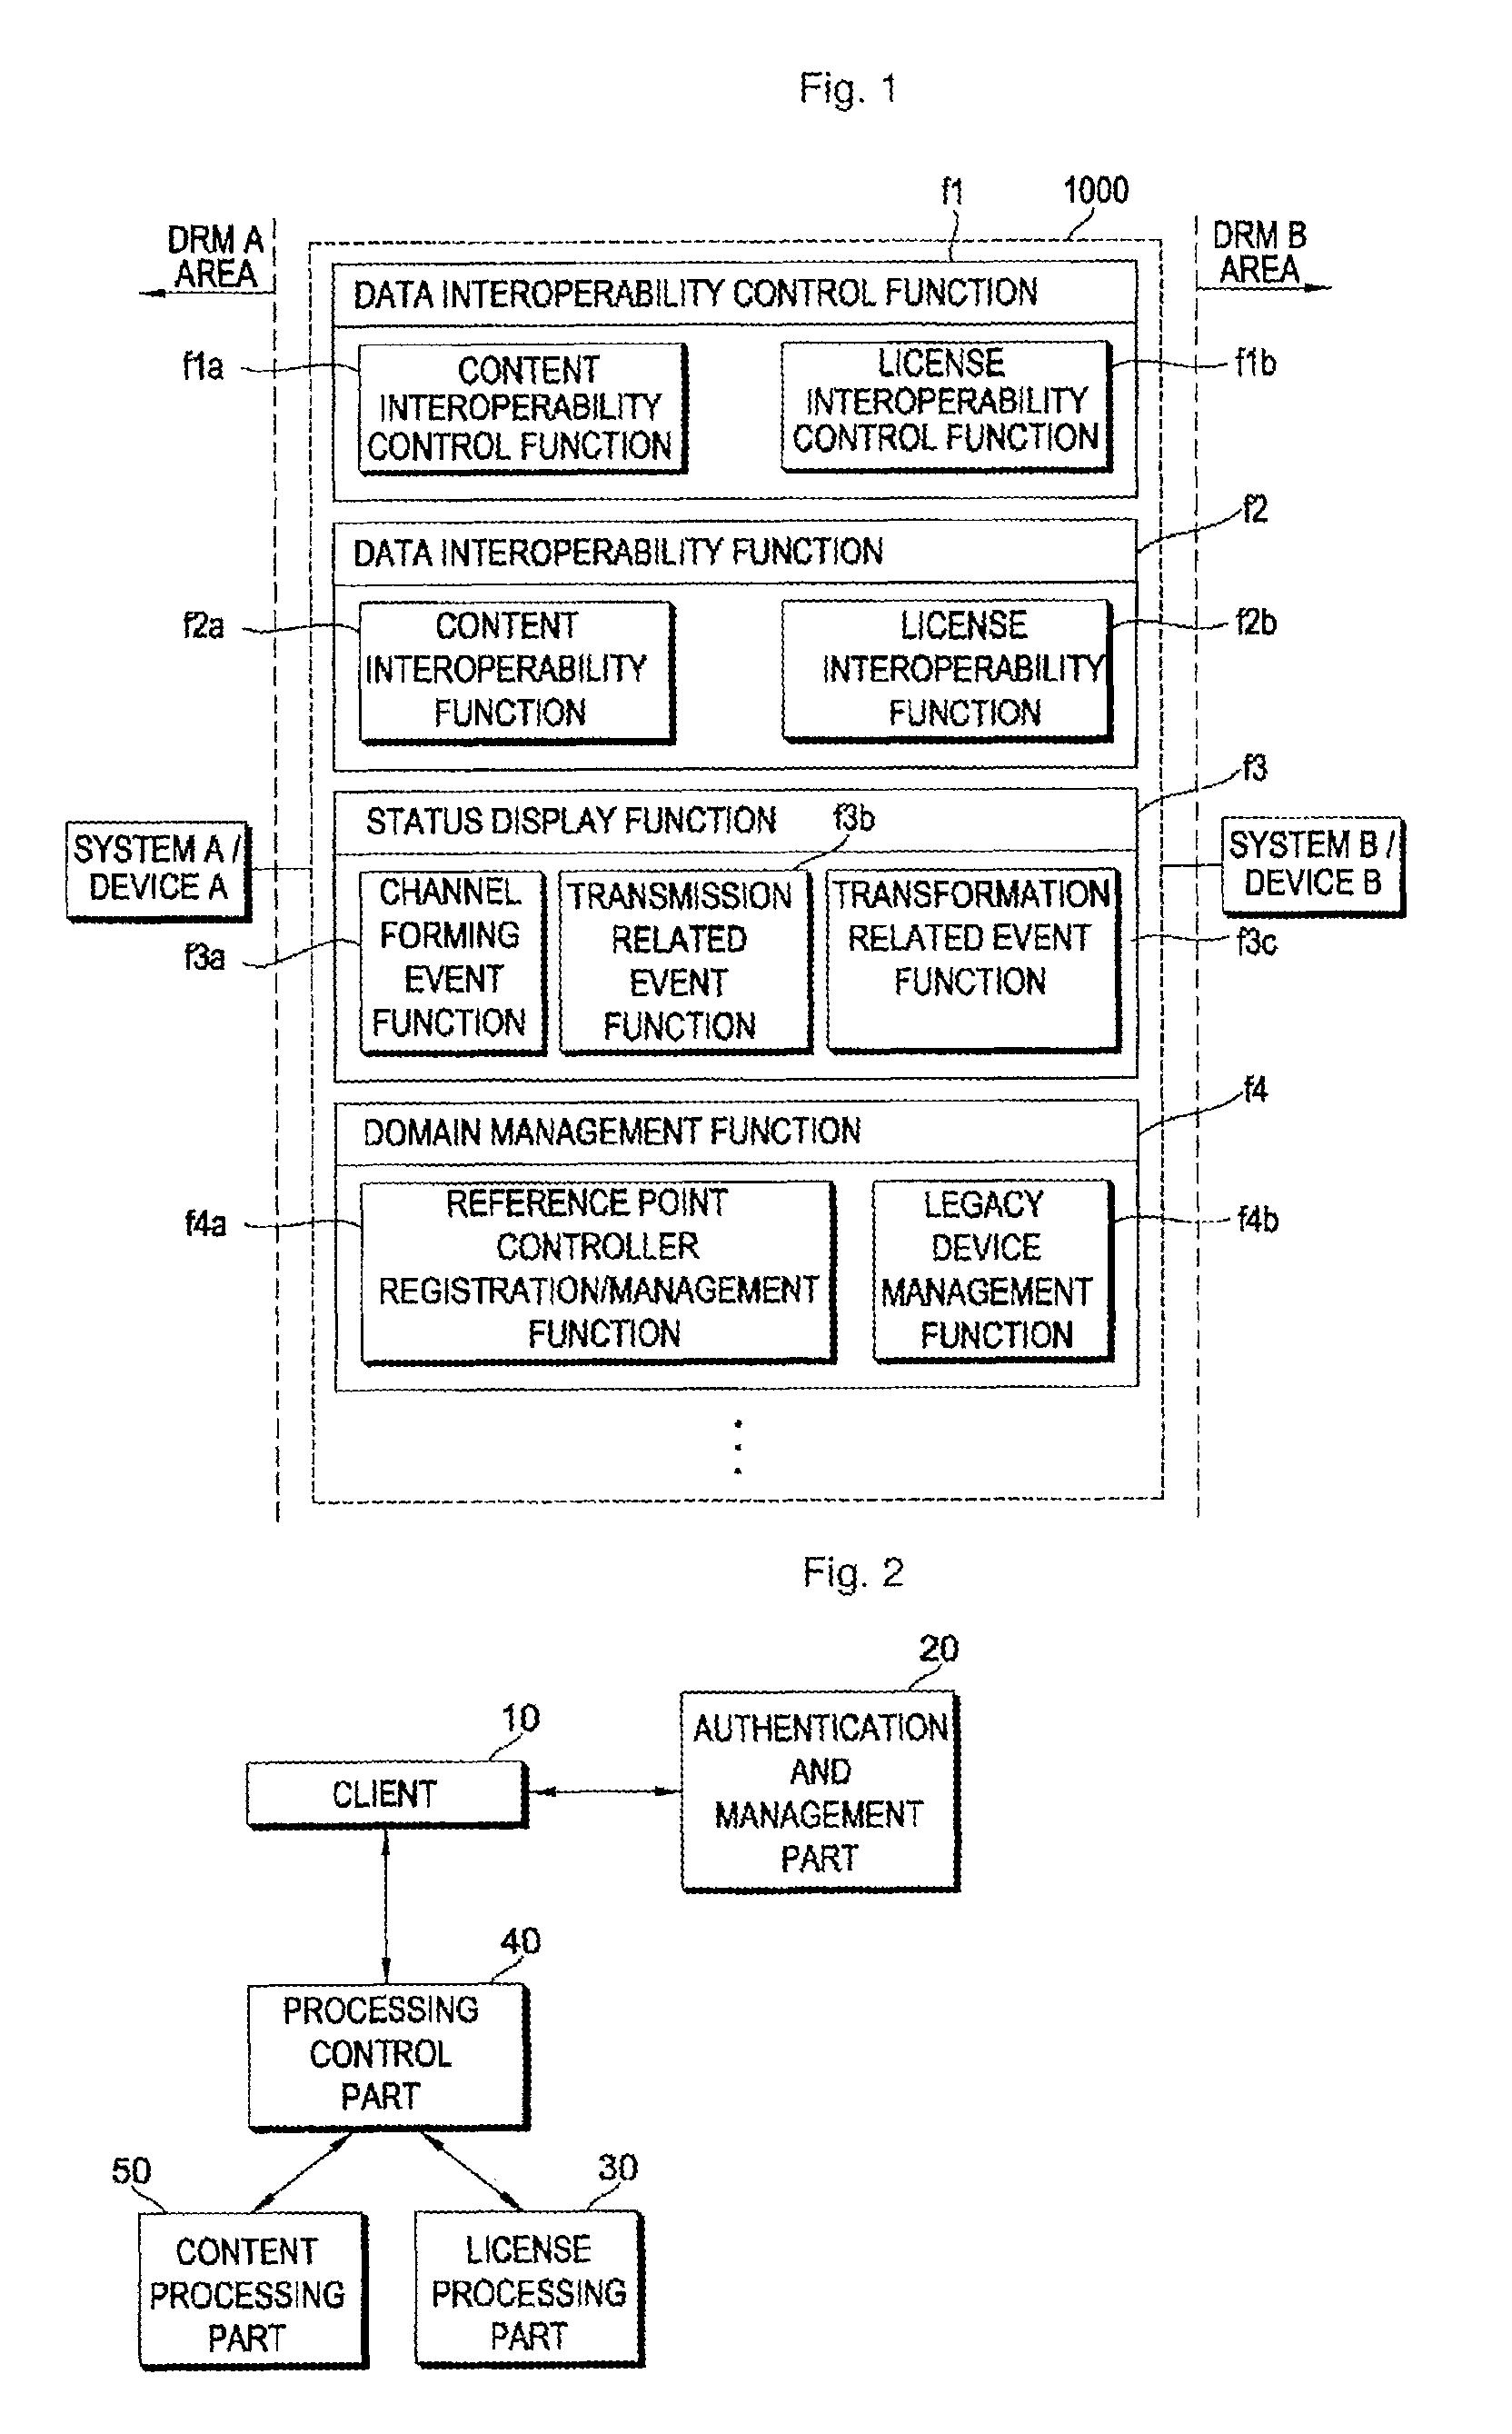 Patent US 8,676,878 B2